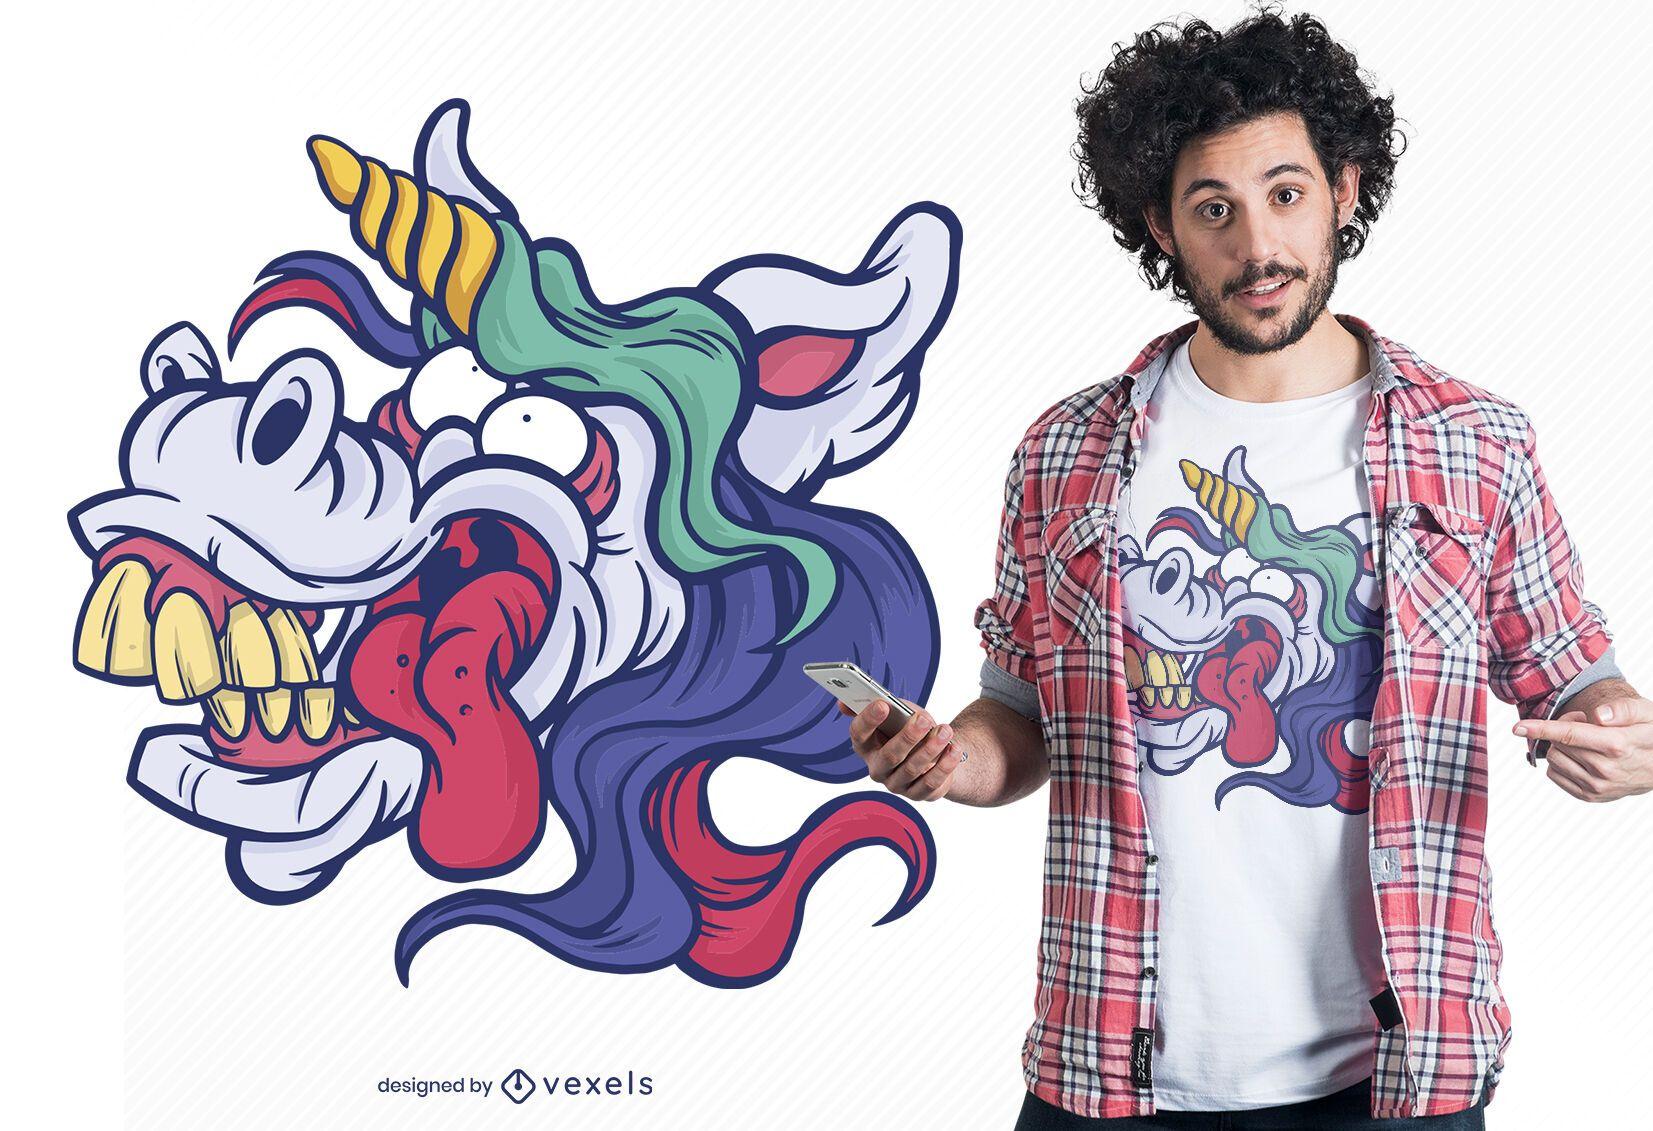 Unicorn silly face t-shirt design